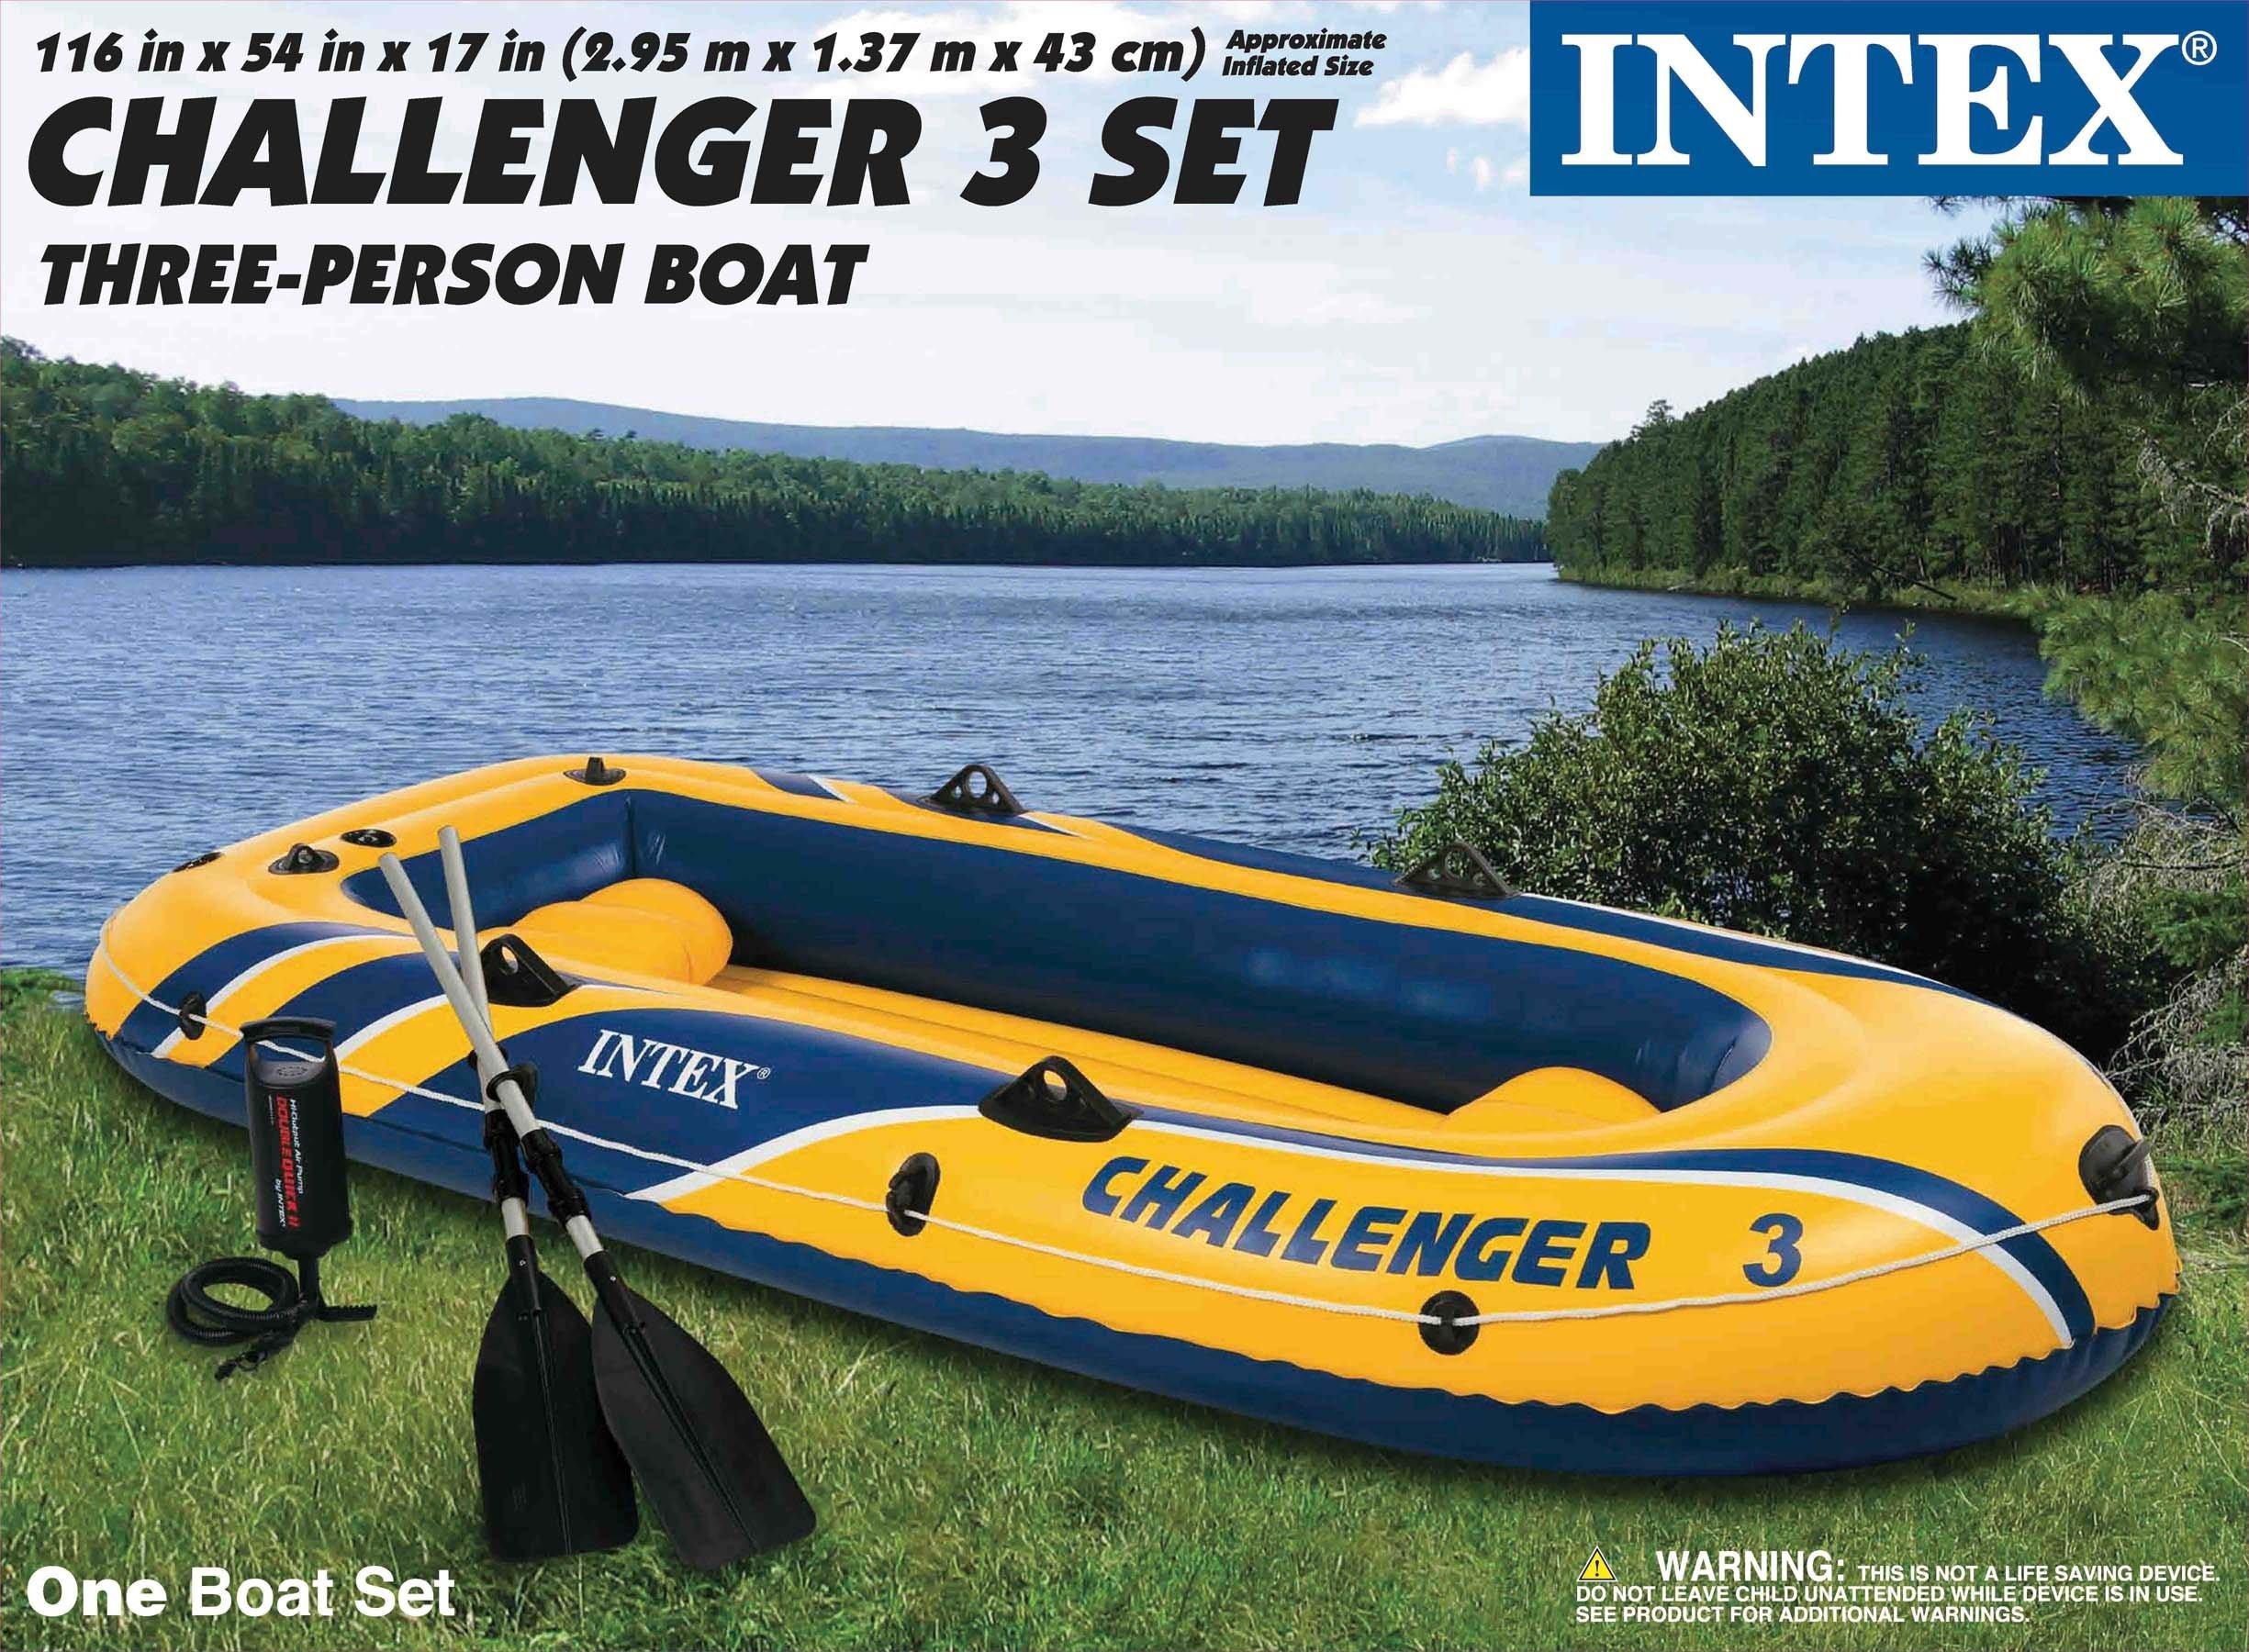 Intex Challenger 300 Set